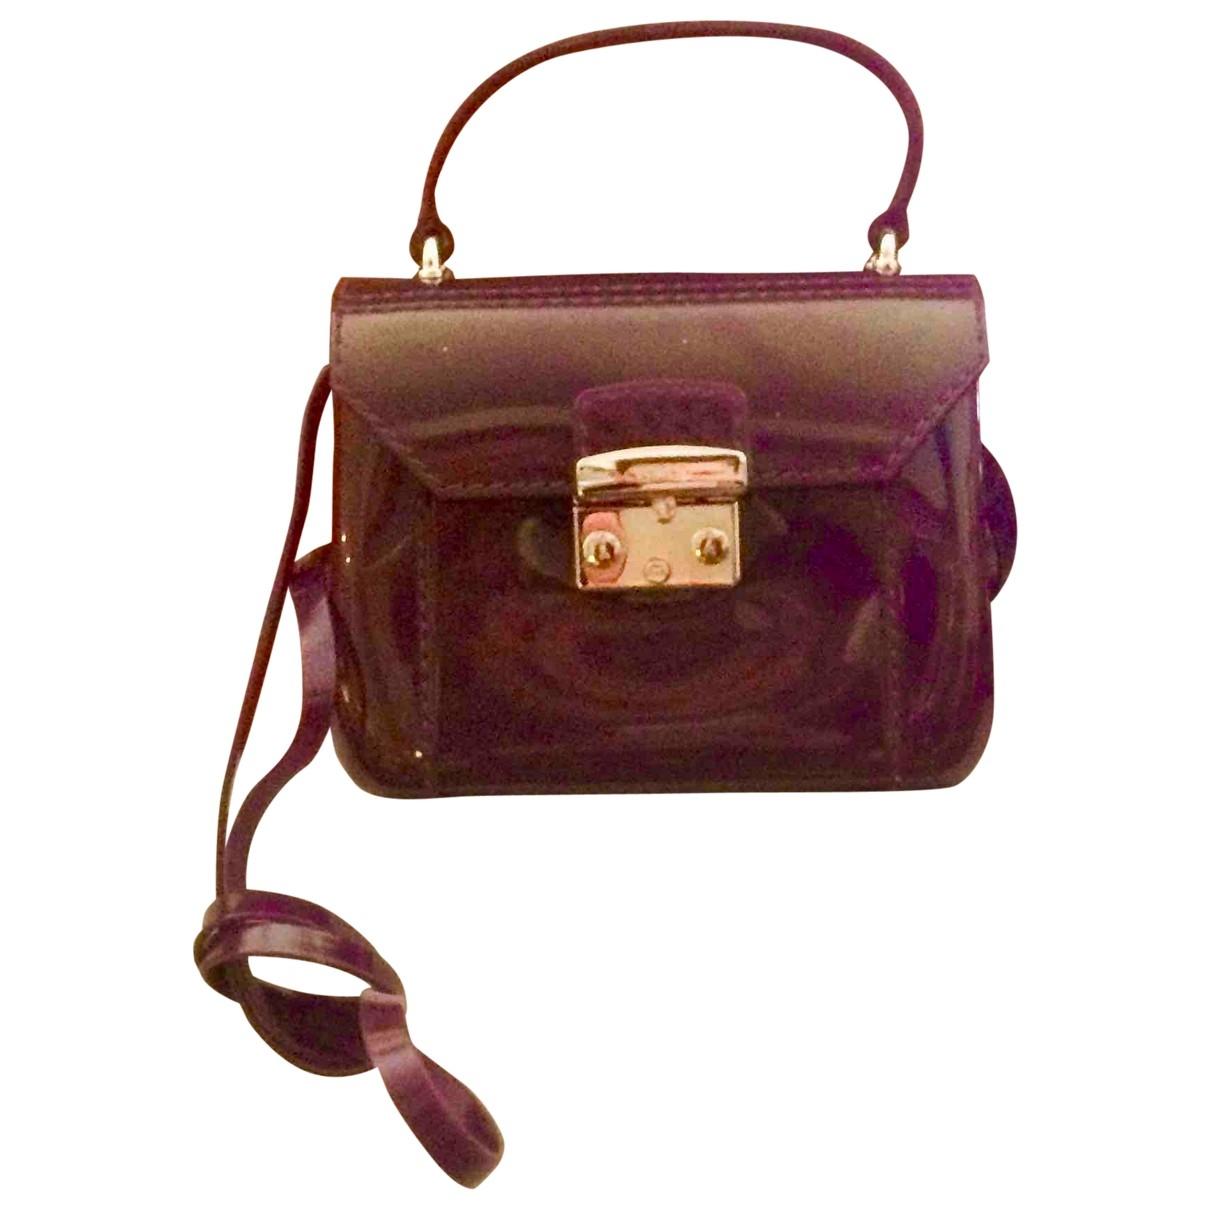 Furla \N Purple handbag for Women \N